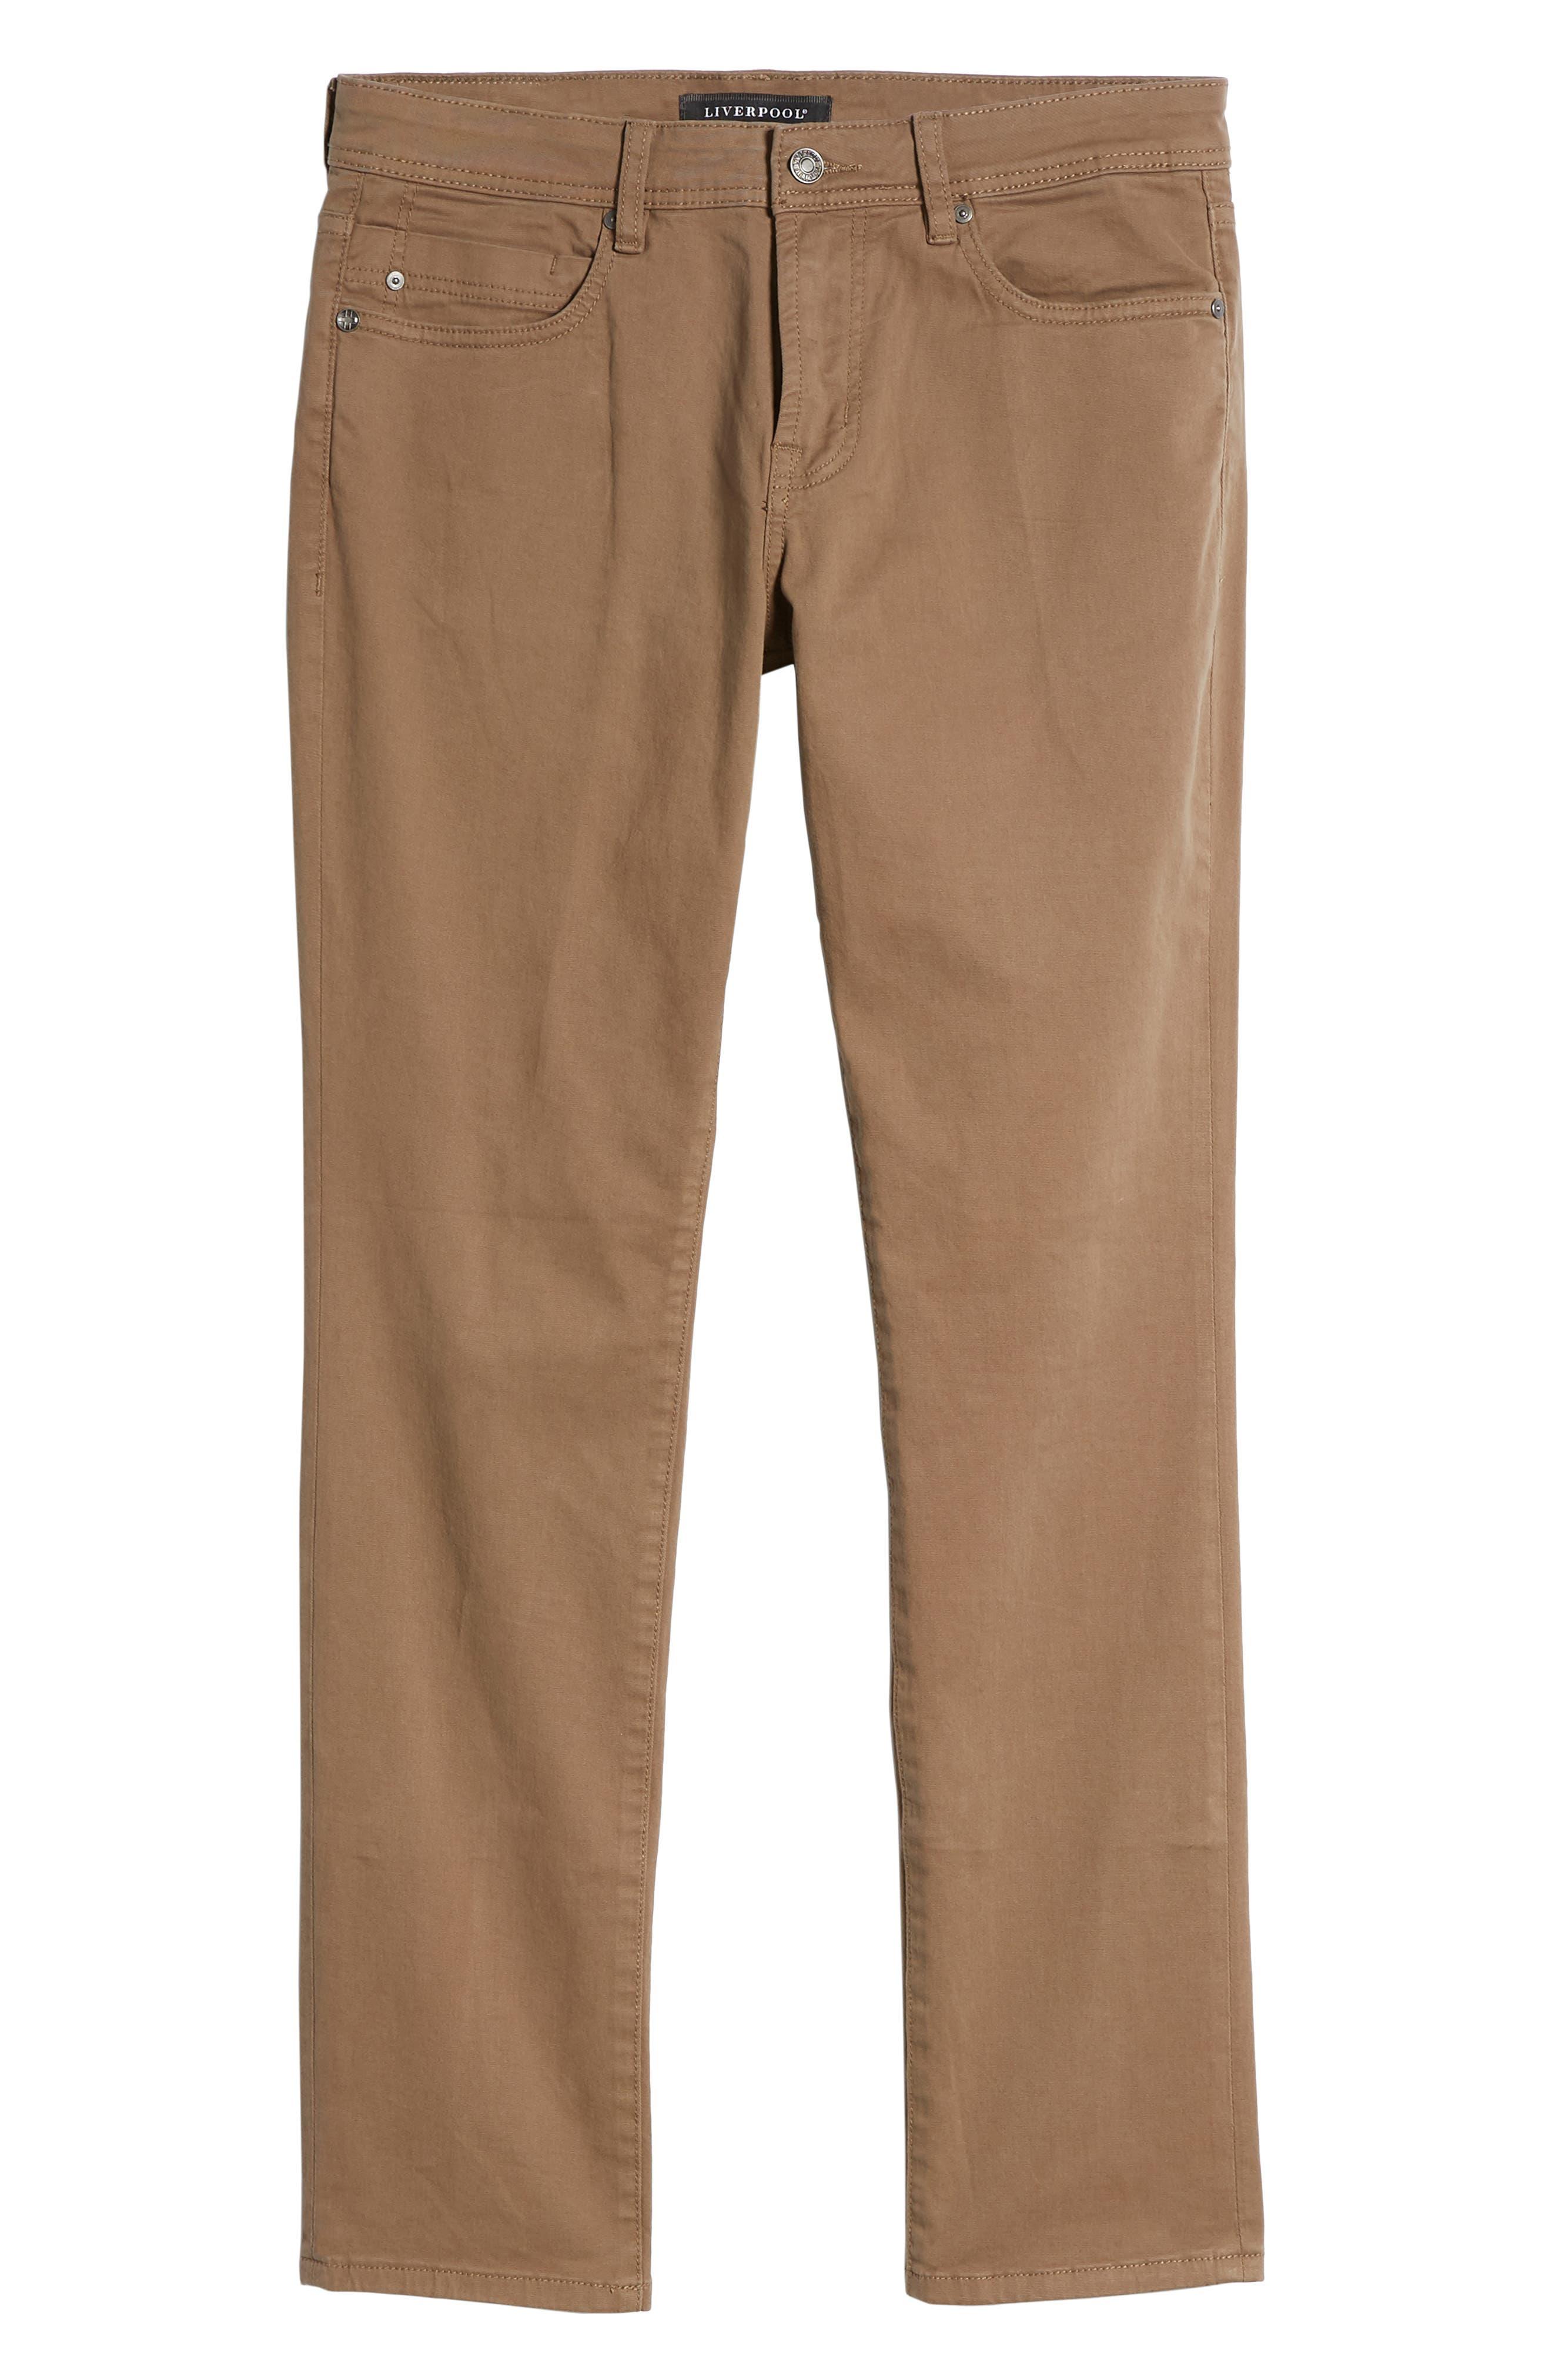 Jeans Co. Slim Straight Leg Jeans,                             Alternate thumbnail 6, color,                             Cub